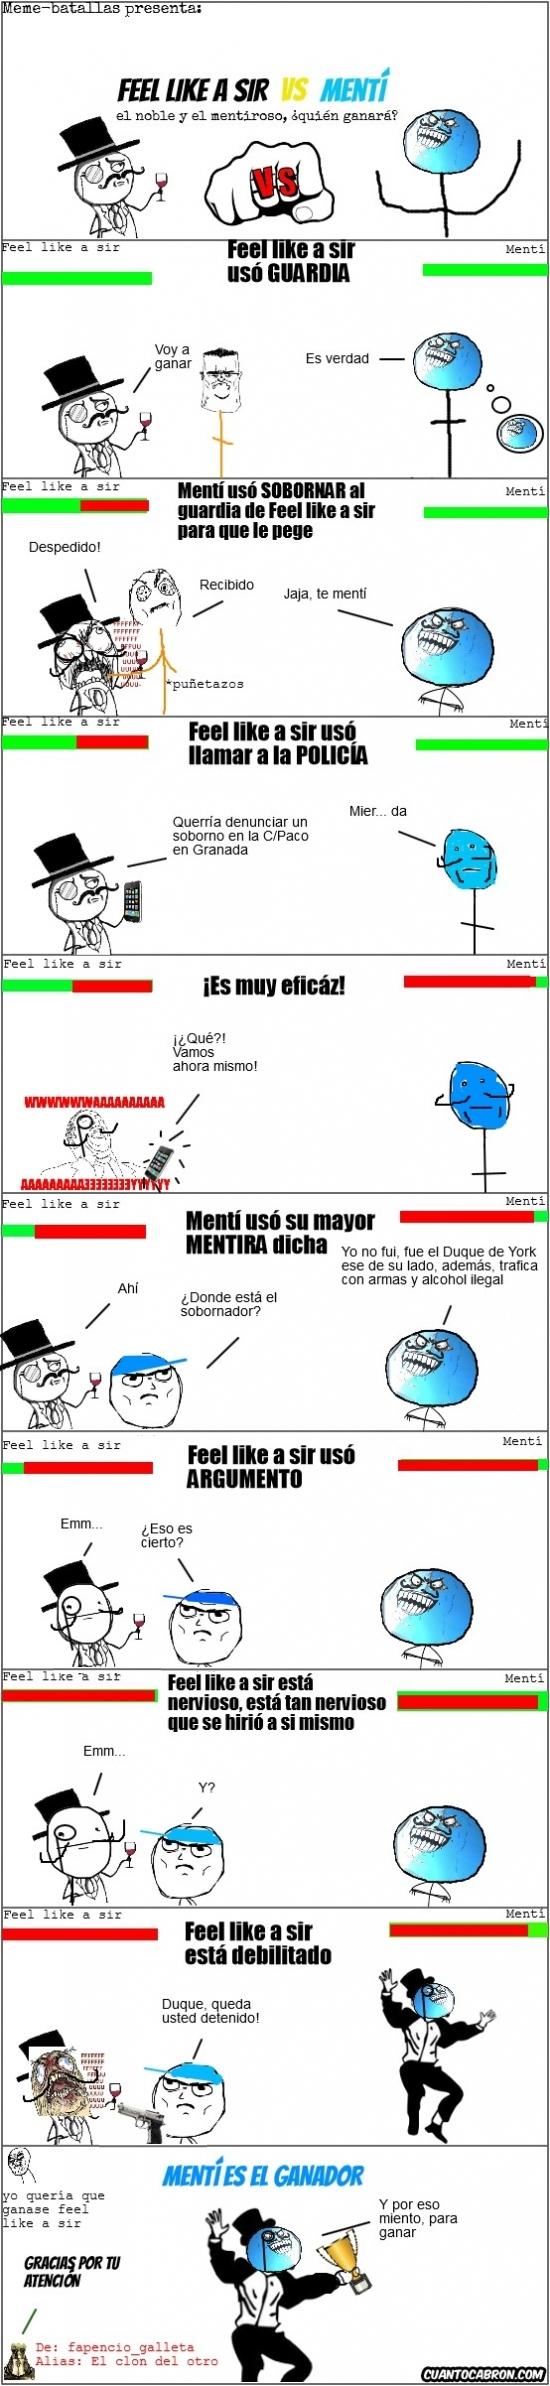 Mix - Feel like a Sir vs. Mentí, ¿quién ganará?